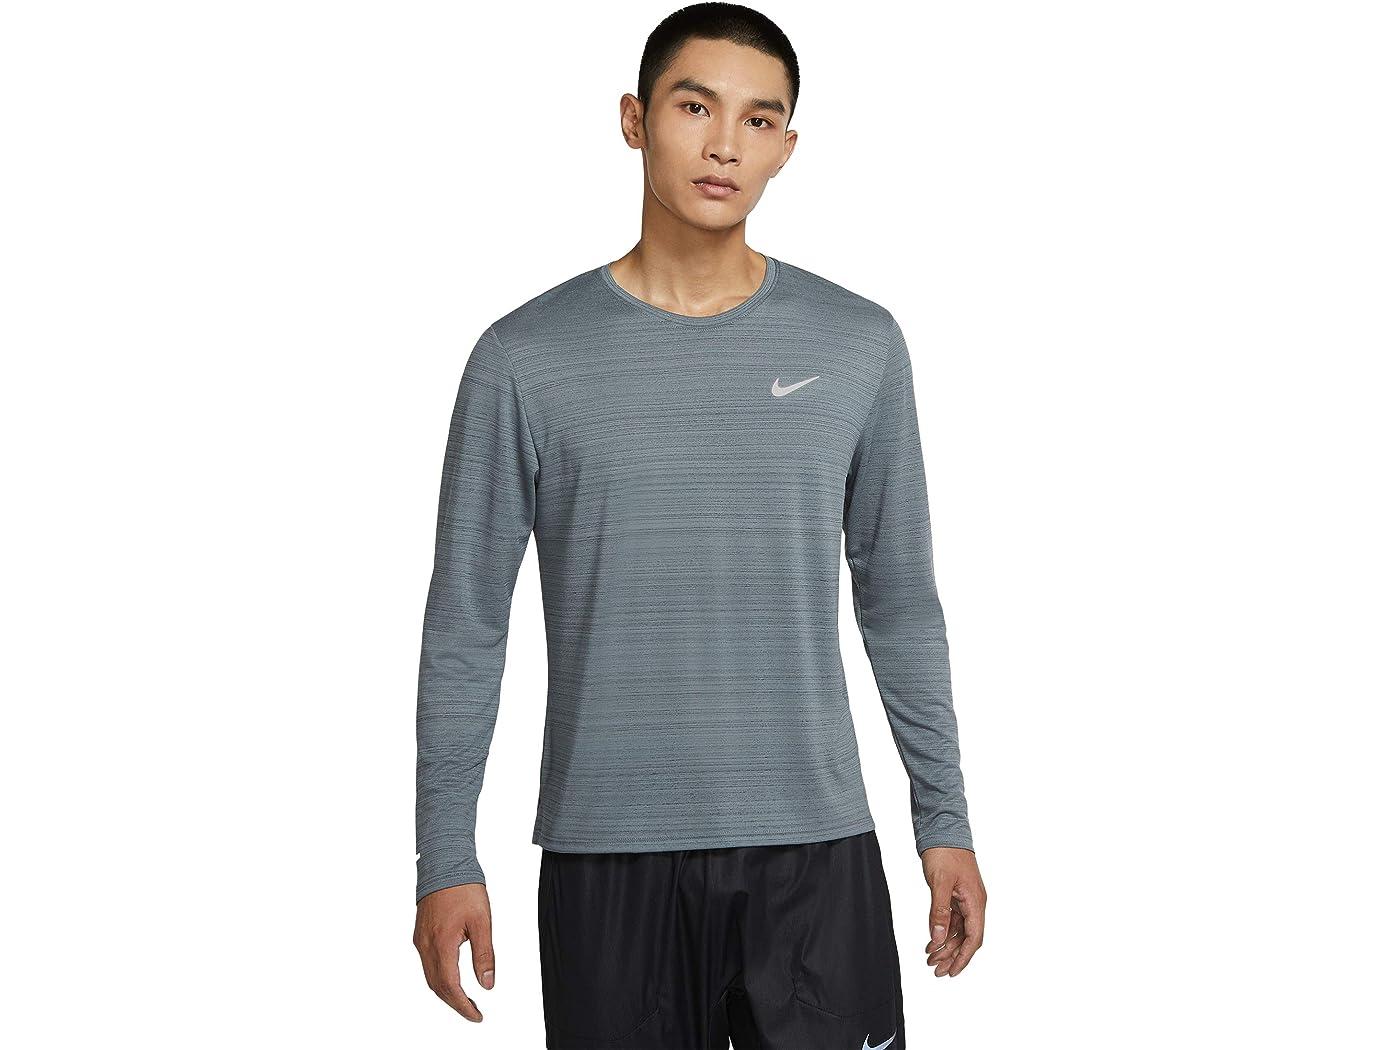 Nike Dri-FIT Miler Top Long Sleeve